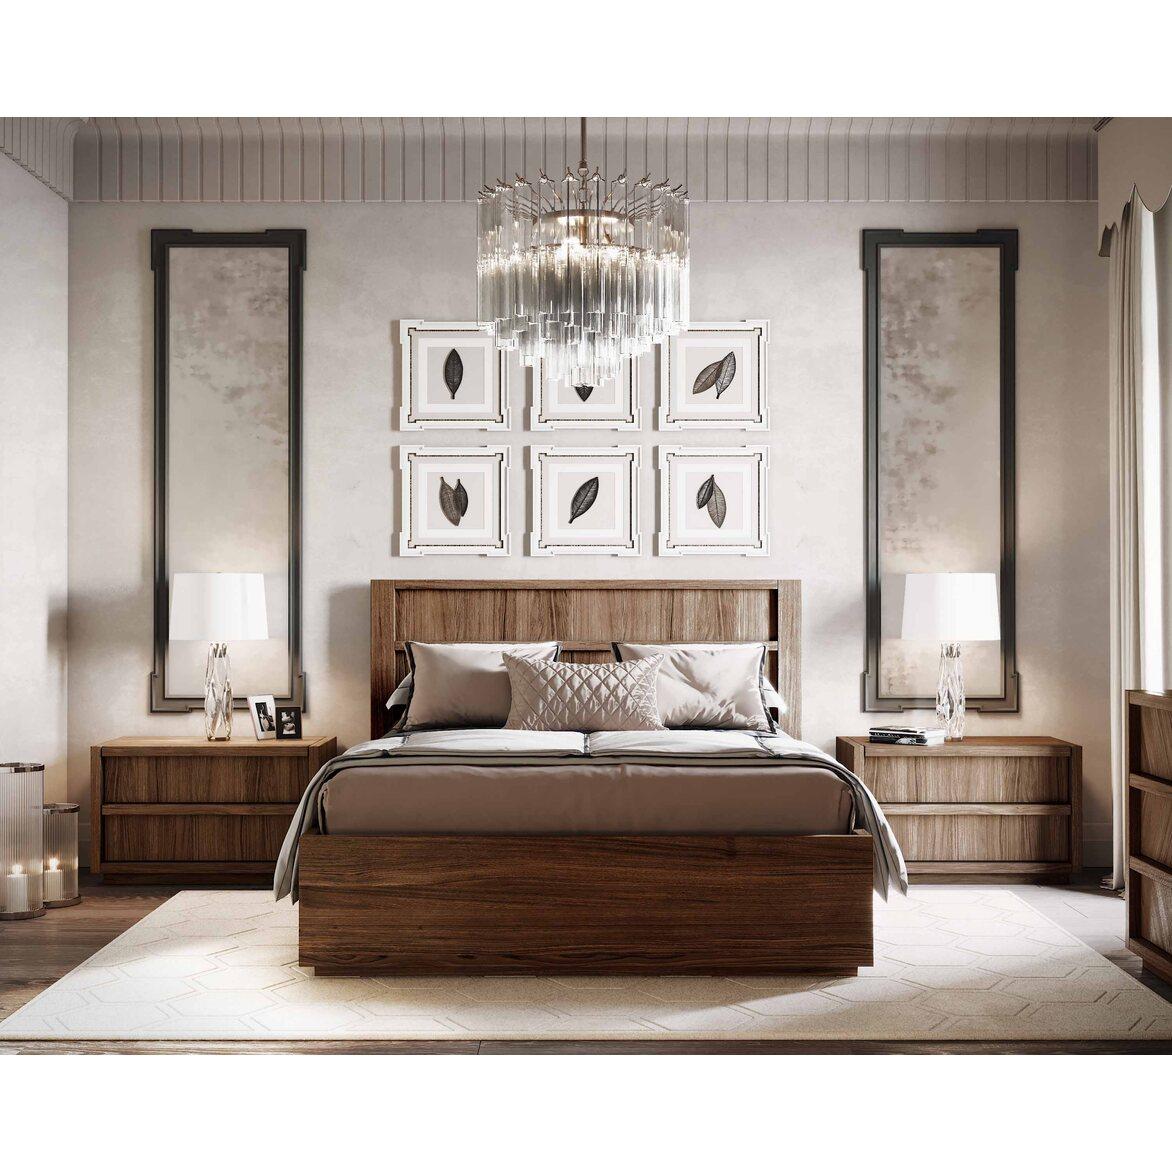 "Кровать 180*200 ""Brenson"" 3 | Двуспальные кровати Kingsby"